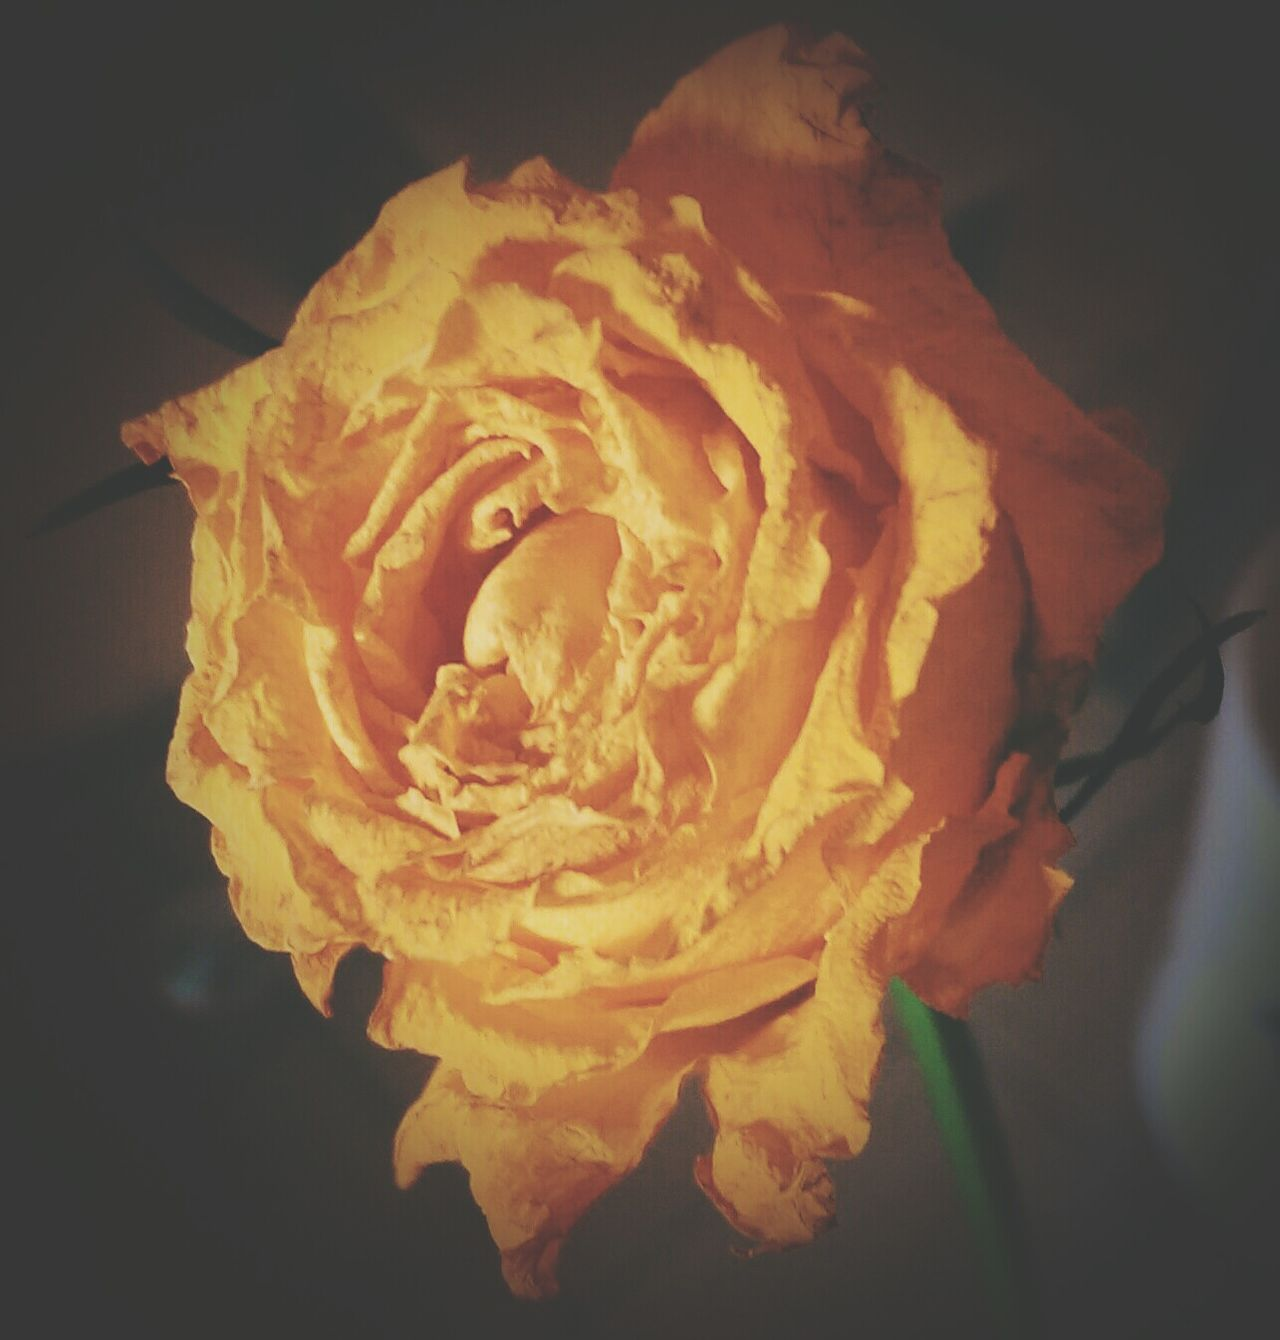 Single Flower Softness Rose - Flower Yellow Rose Fragility Growth Process Flowerporn Edited Eyem Best Edits Eyemphotography Yellow Eyem Gallery Flower Head Yellow Flower Dried Flowers Close-up No People